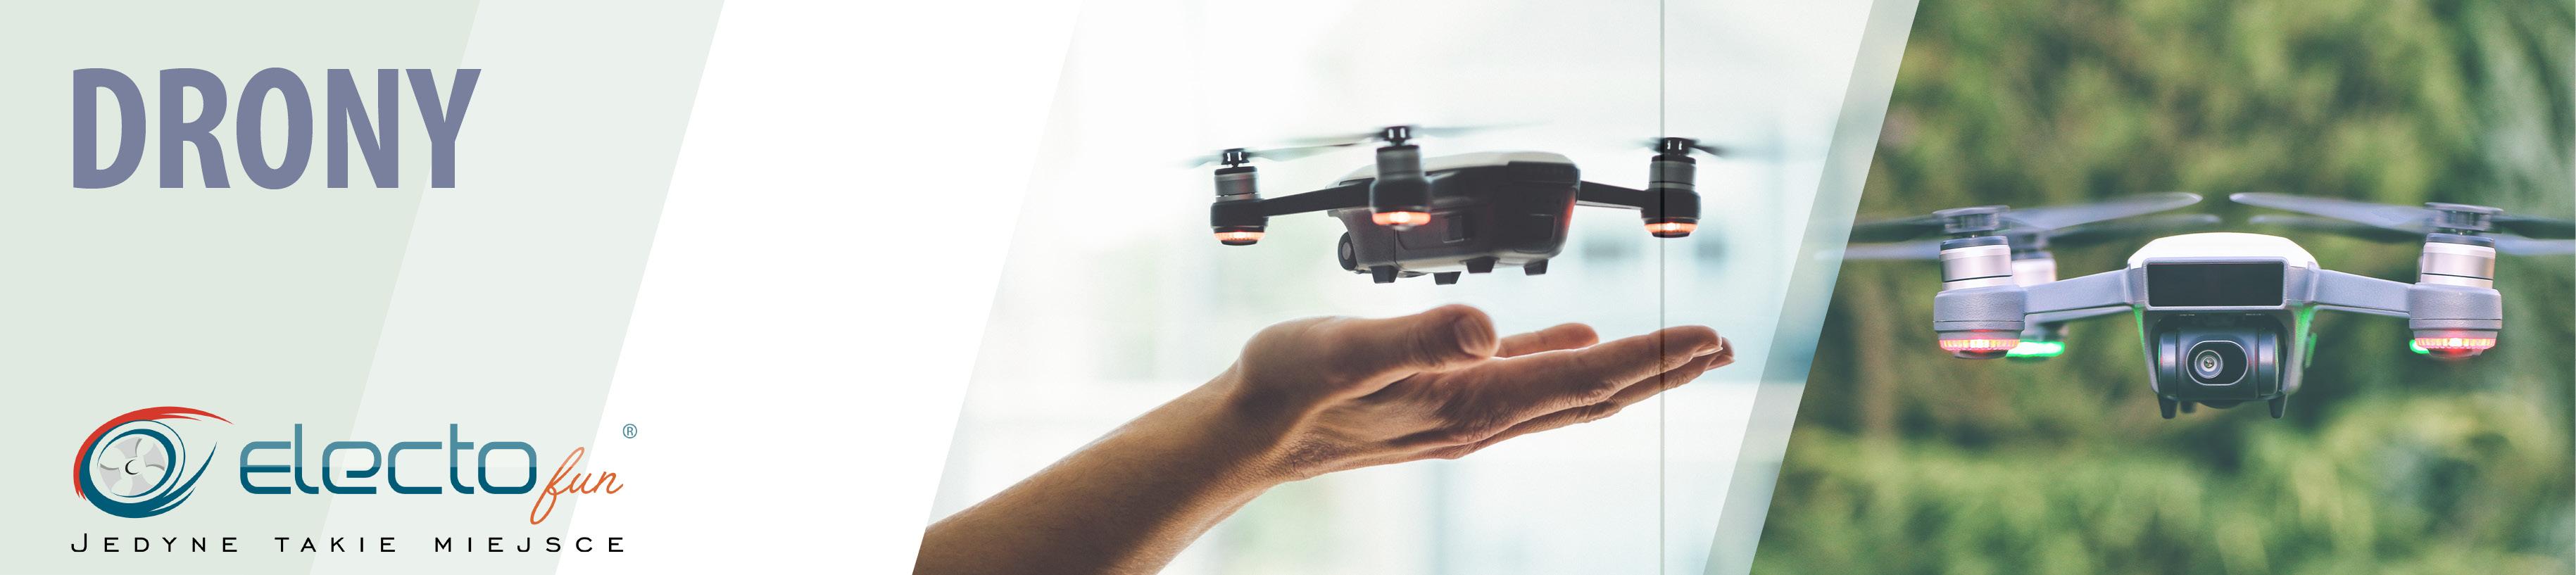 baner - drony.jpg